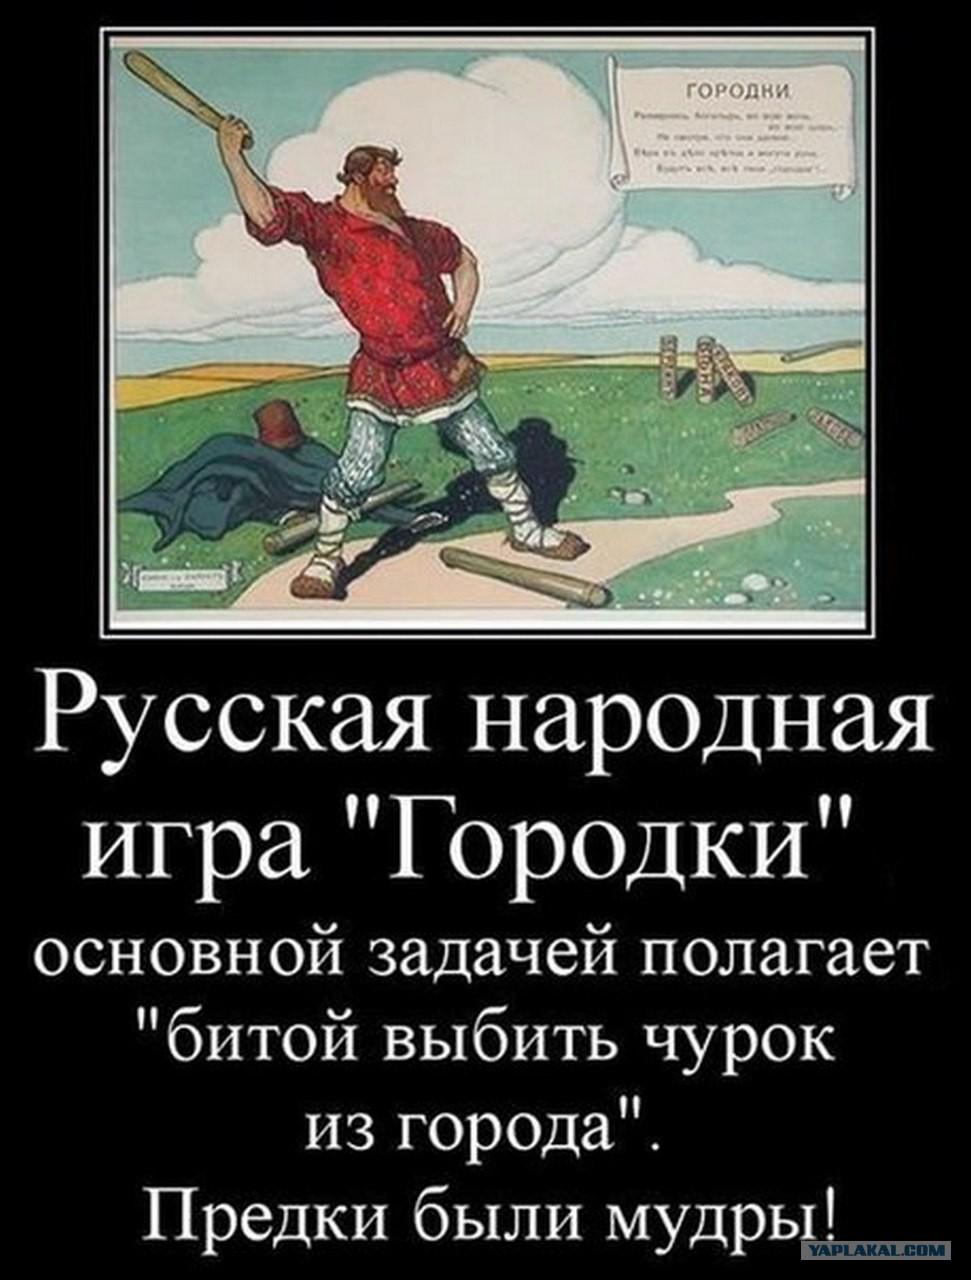 http://s00.yaplakal.com/pics/pics_original/3/8/0/2472083.jpg